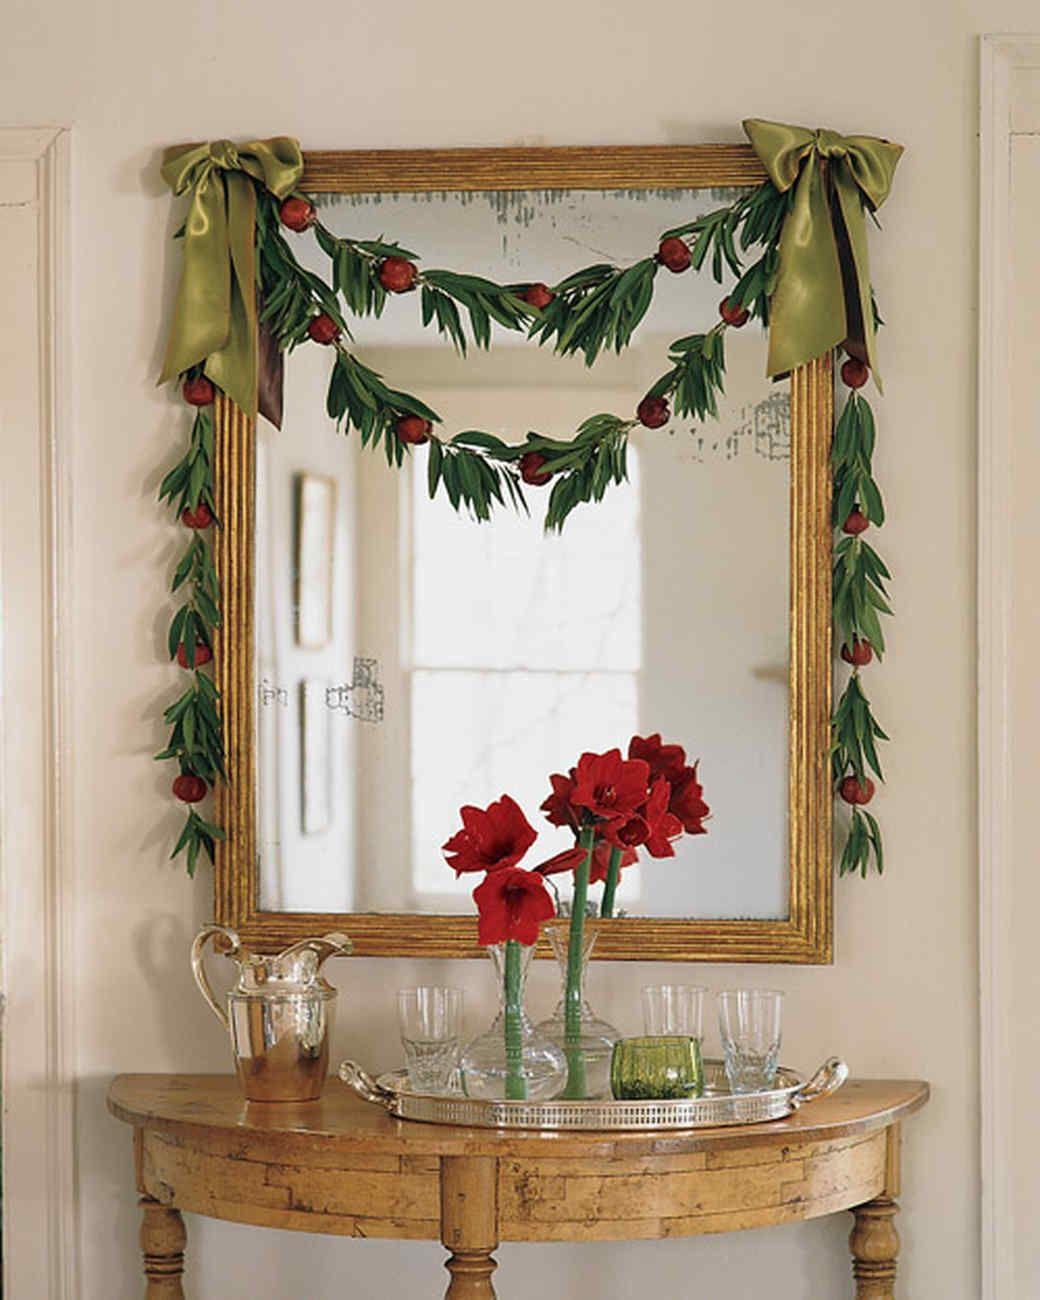 Bay Leaf And Pomegranate Garland Christmas Decor Ideas | Martha Stewart  Living U2014 Drape This Delicate